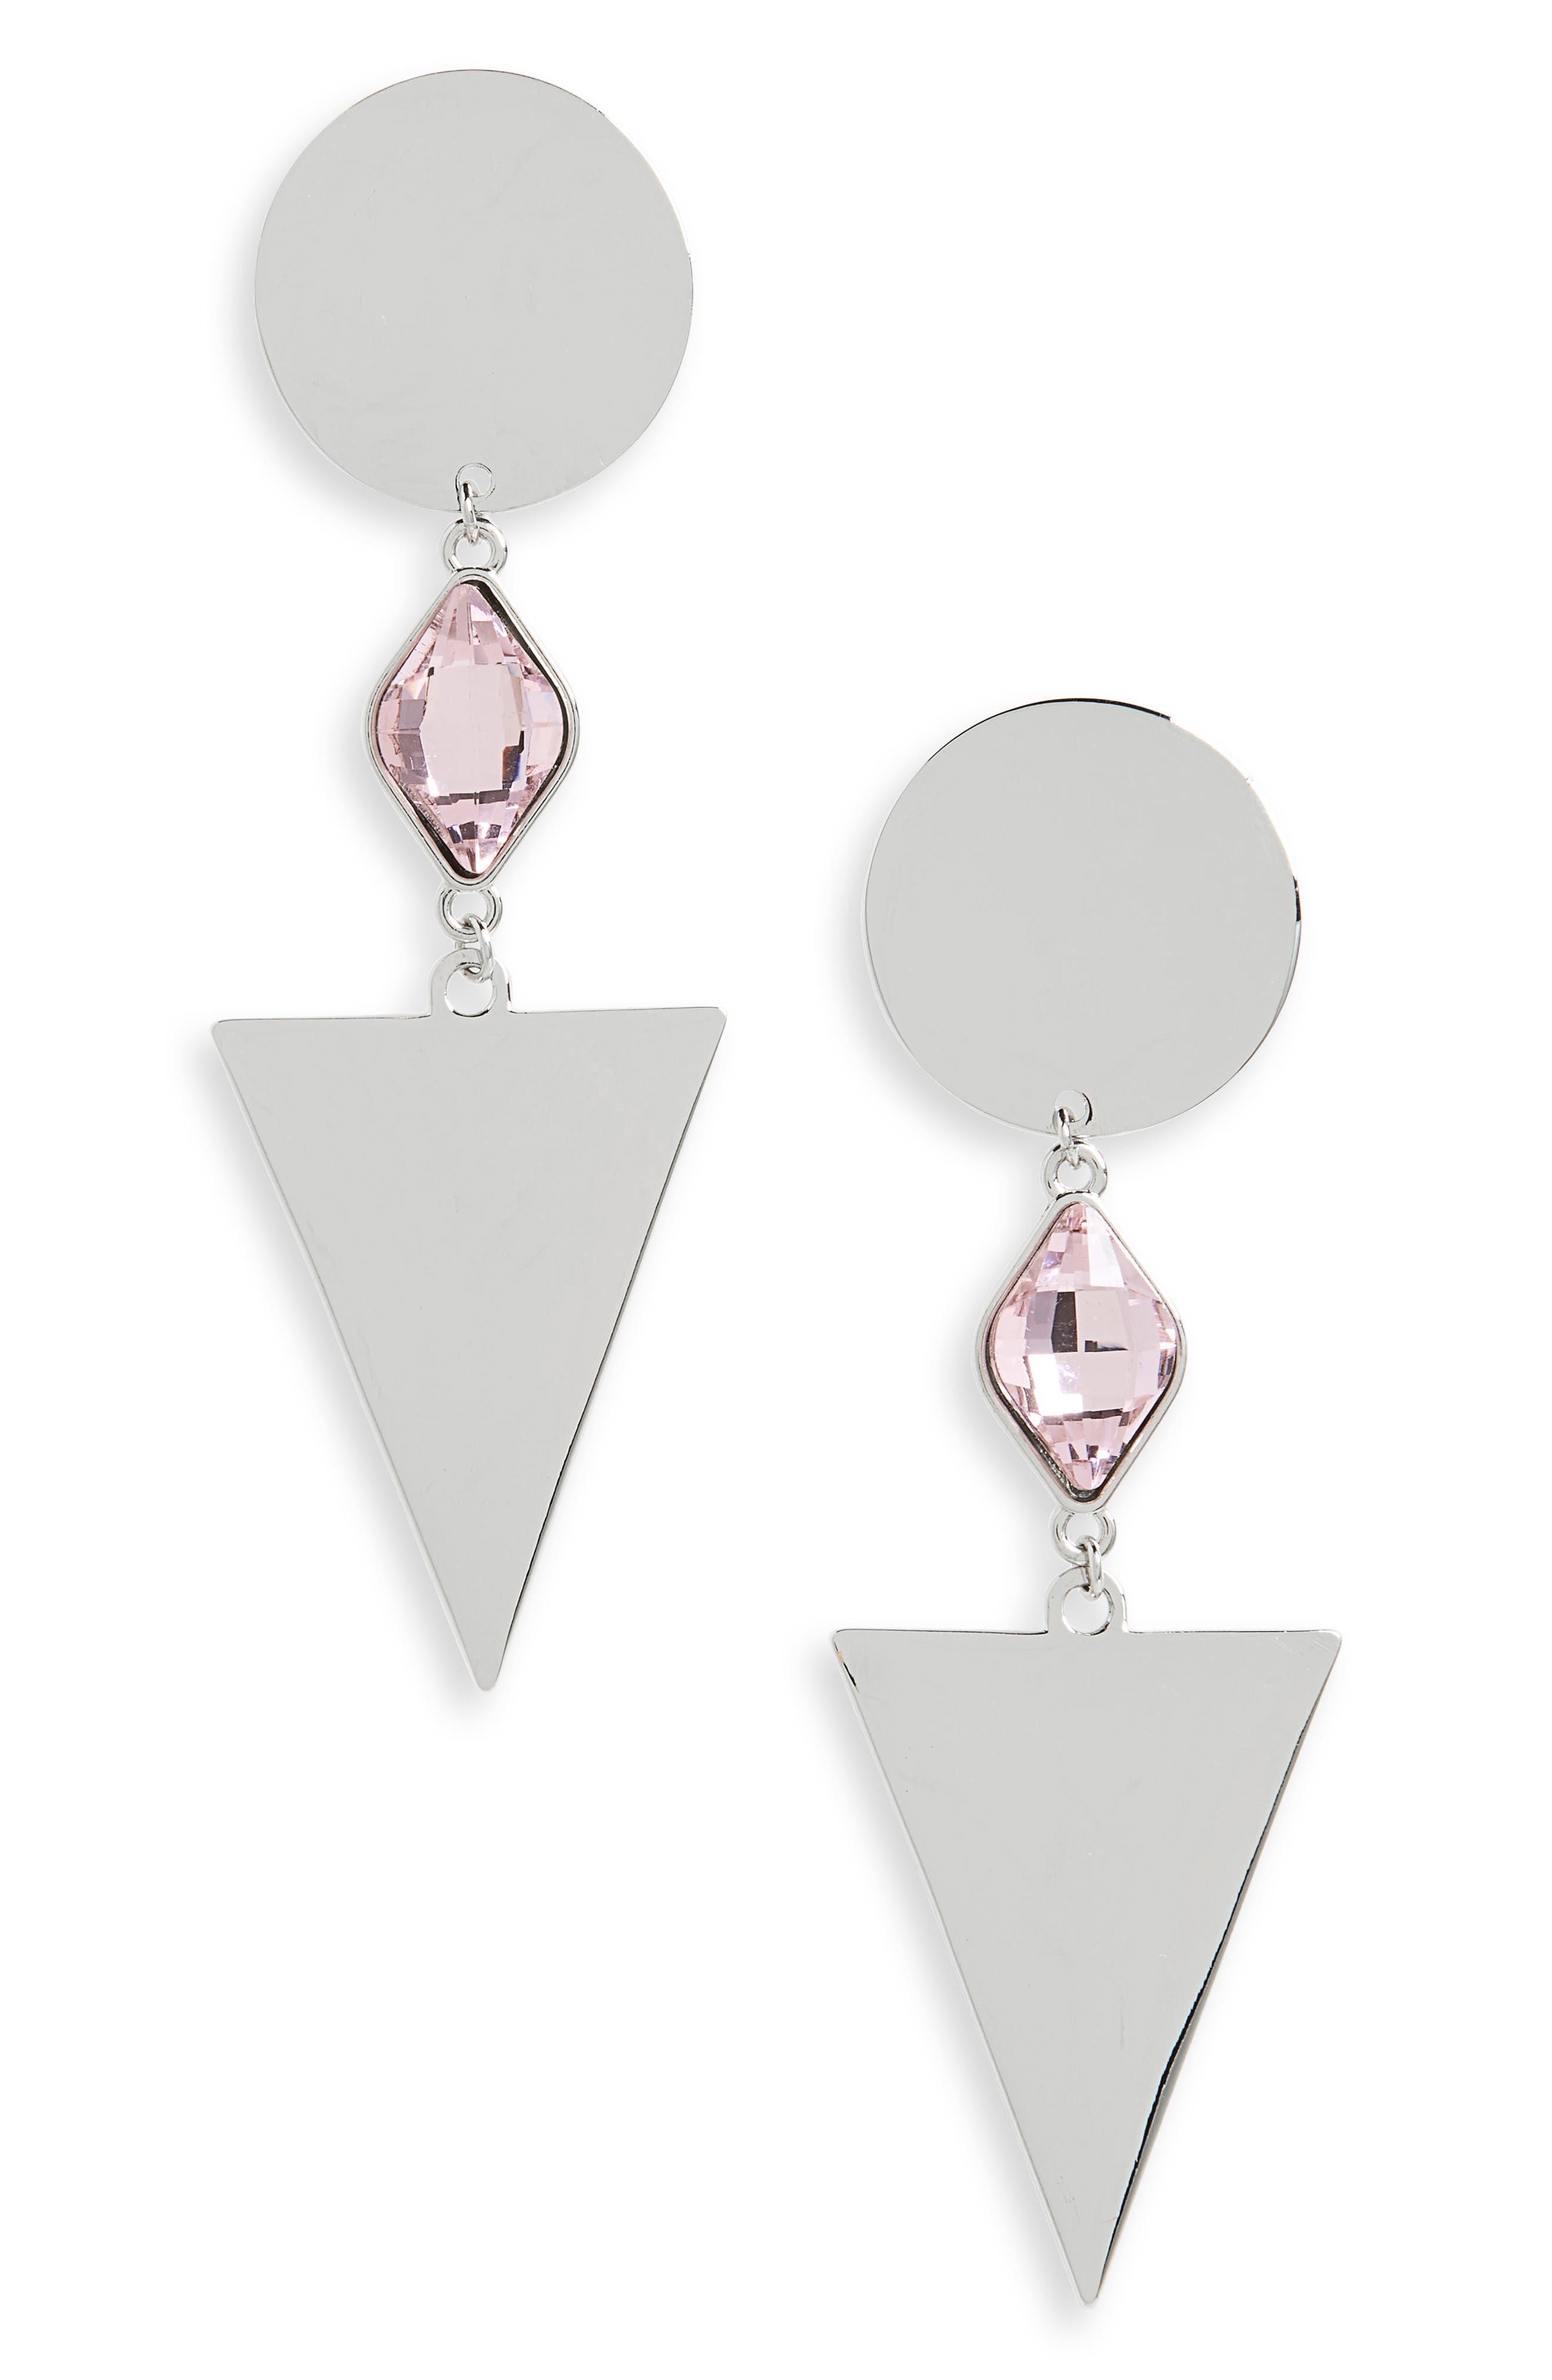 Geometric Crystal Drop Earrings,                         Main,                         color, Silver/ Pink